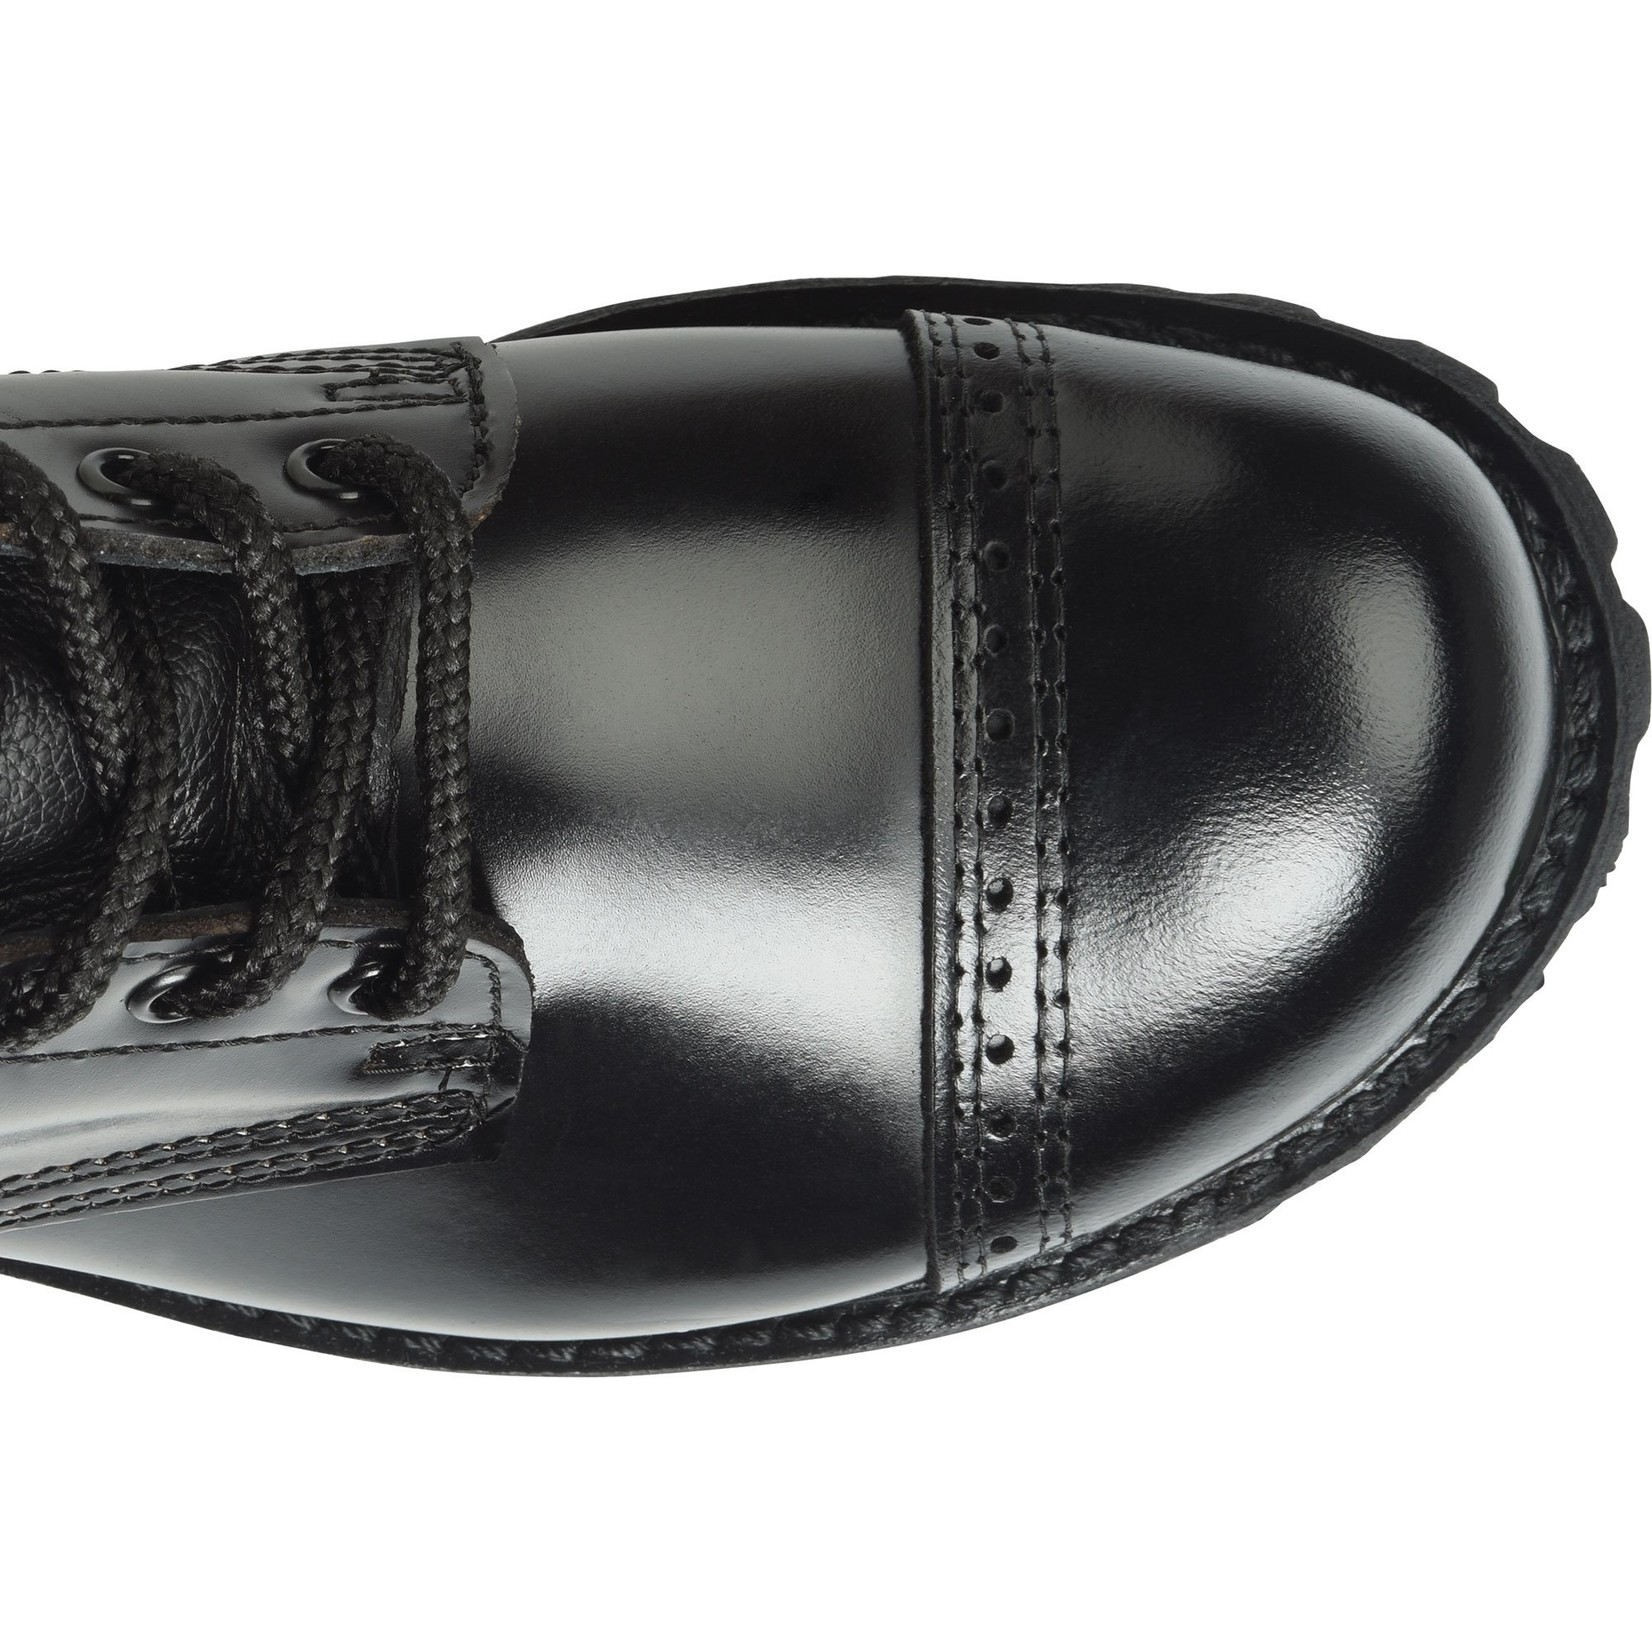 "Corcoran Men's Corcoran 10"" Side Zipper Boot 985"